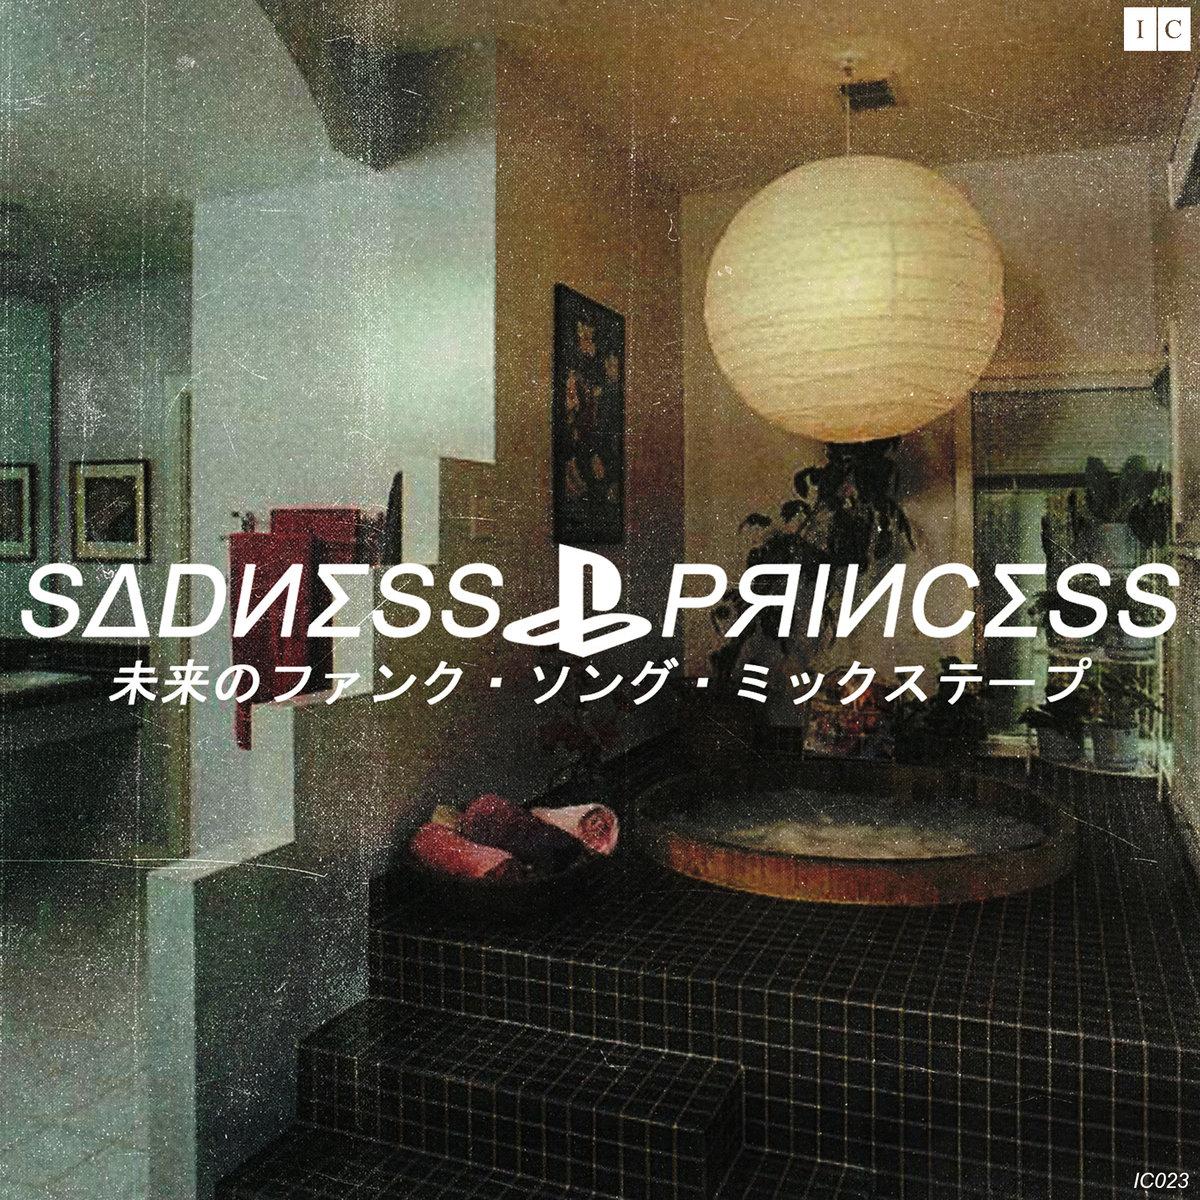 Sadness princess